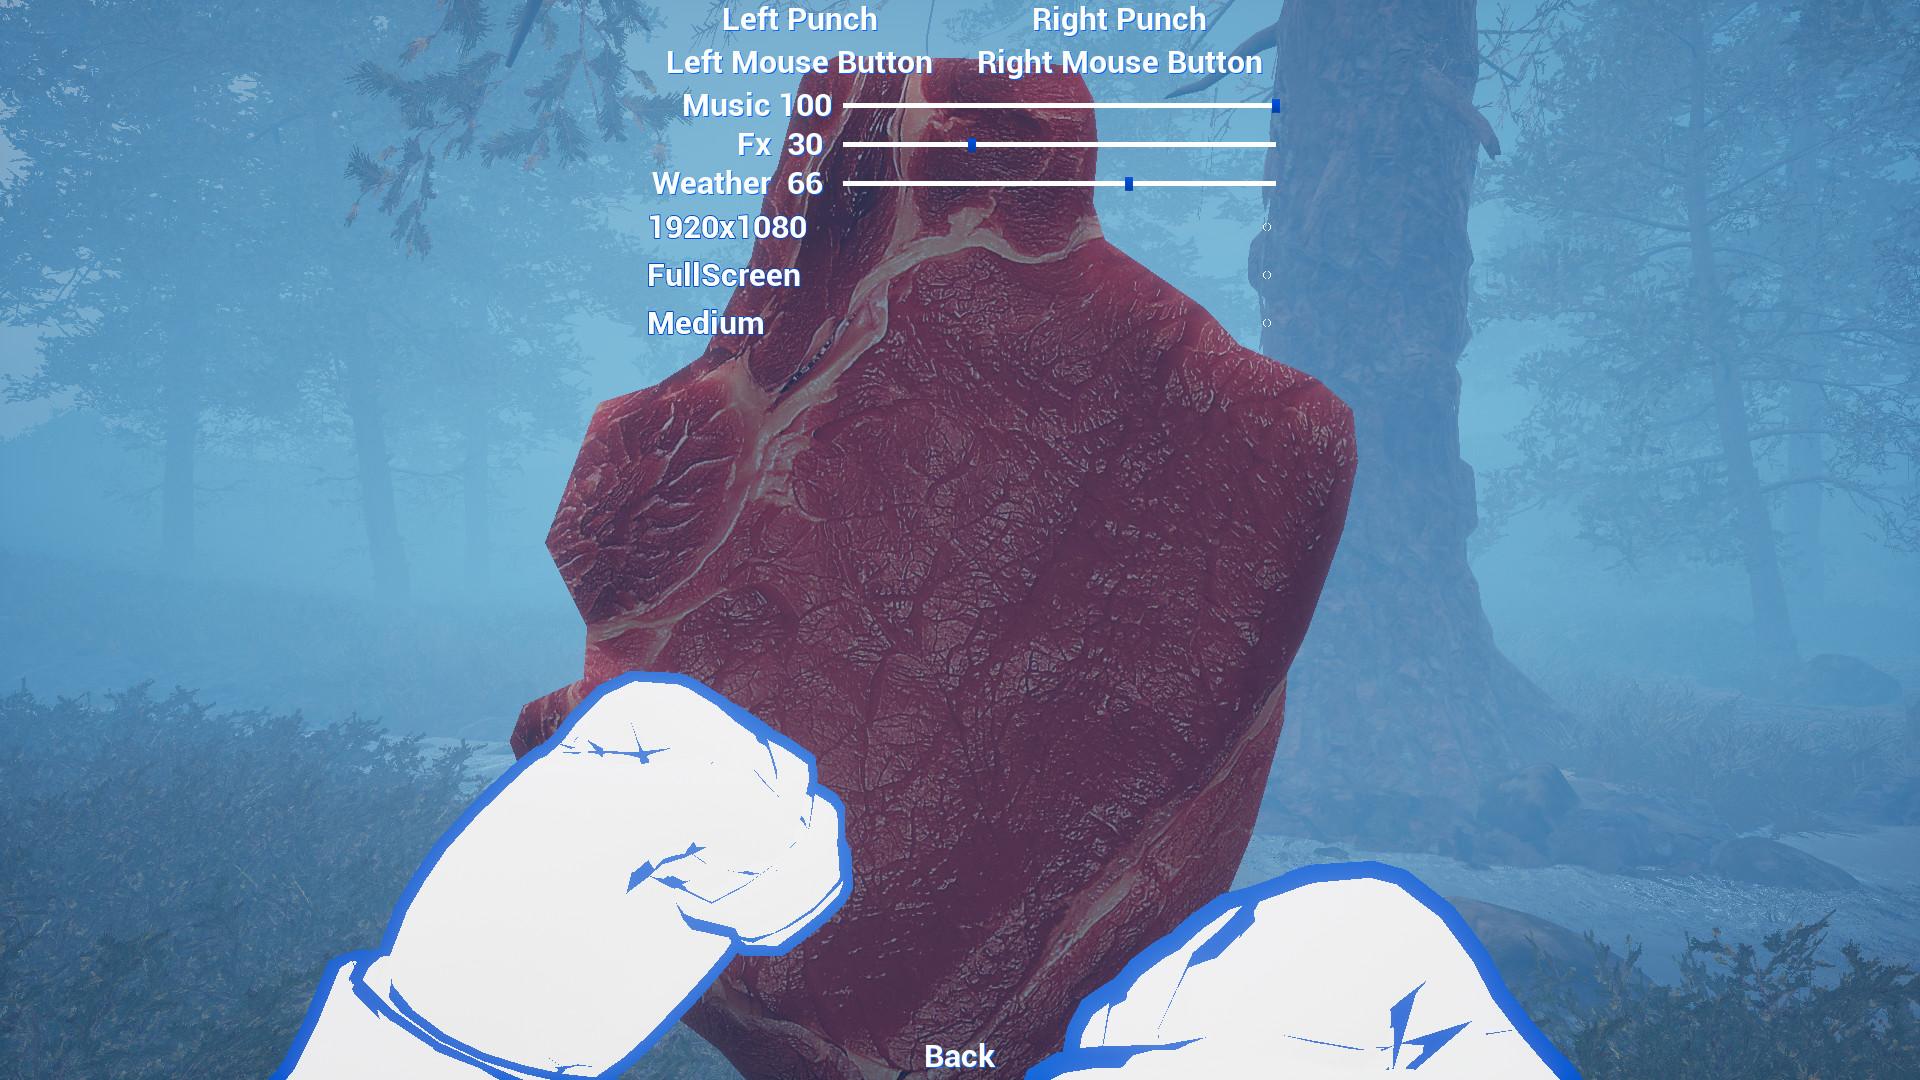 Meat Beating: No More Horny screenshot